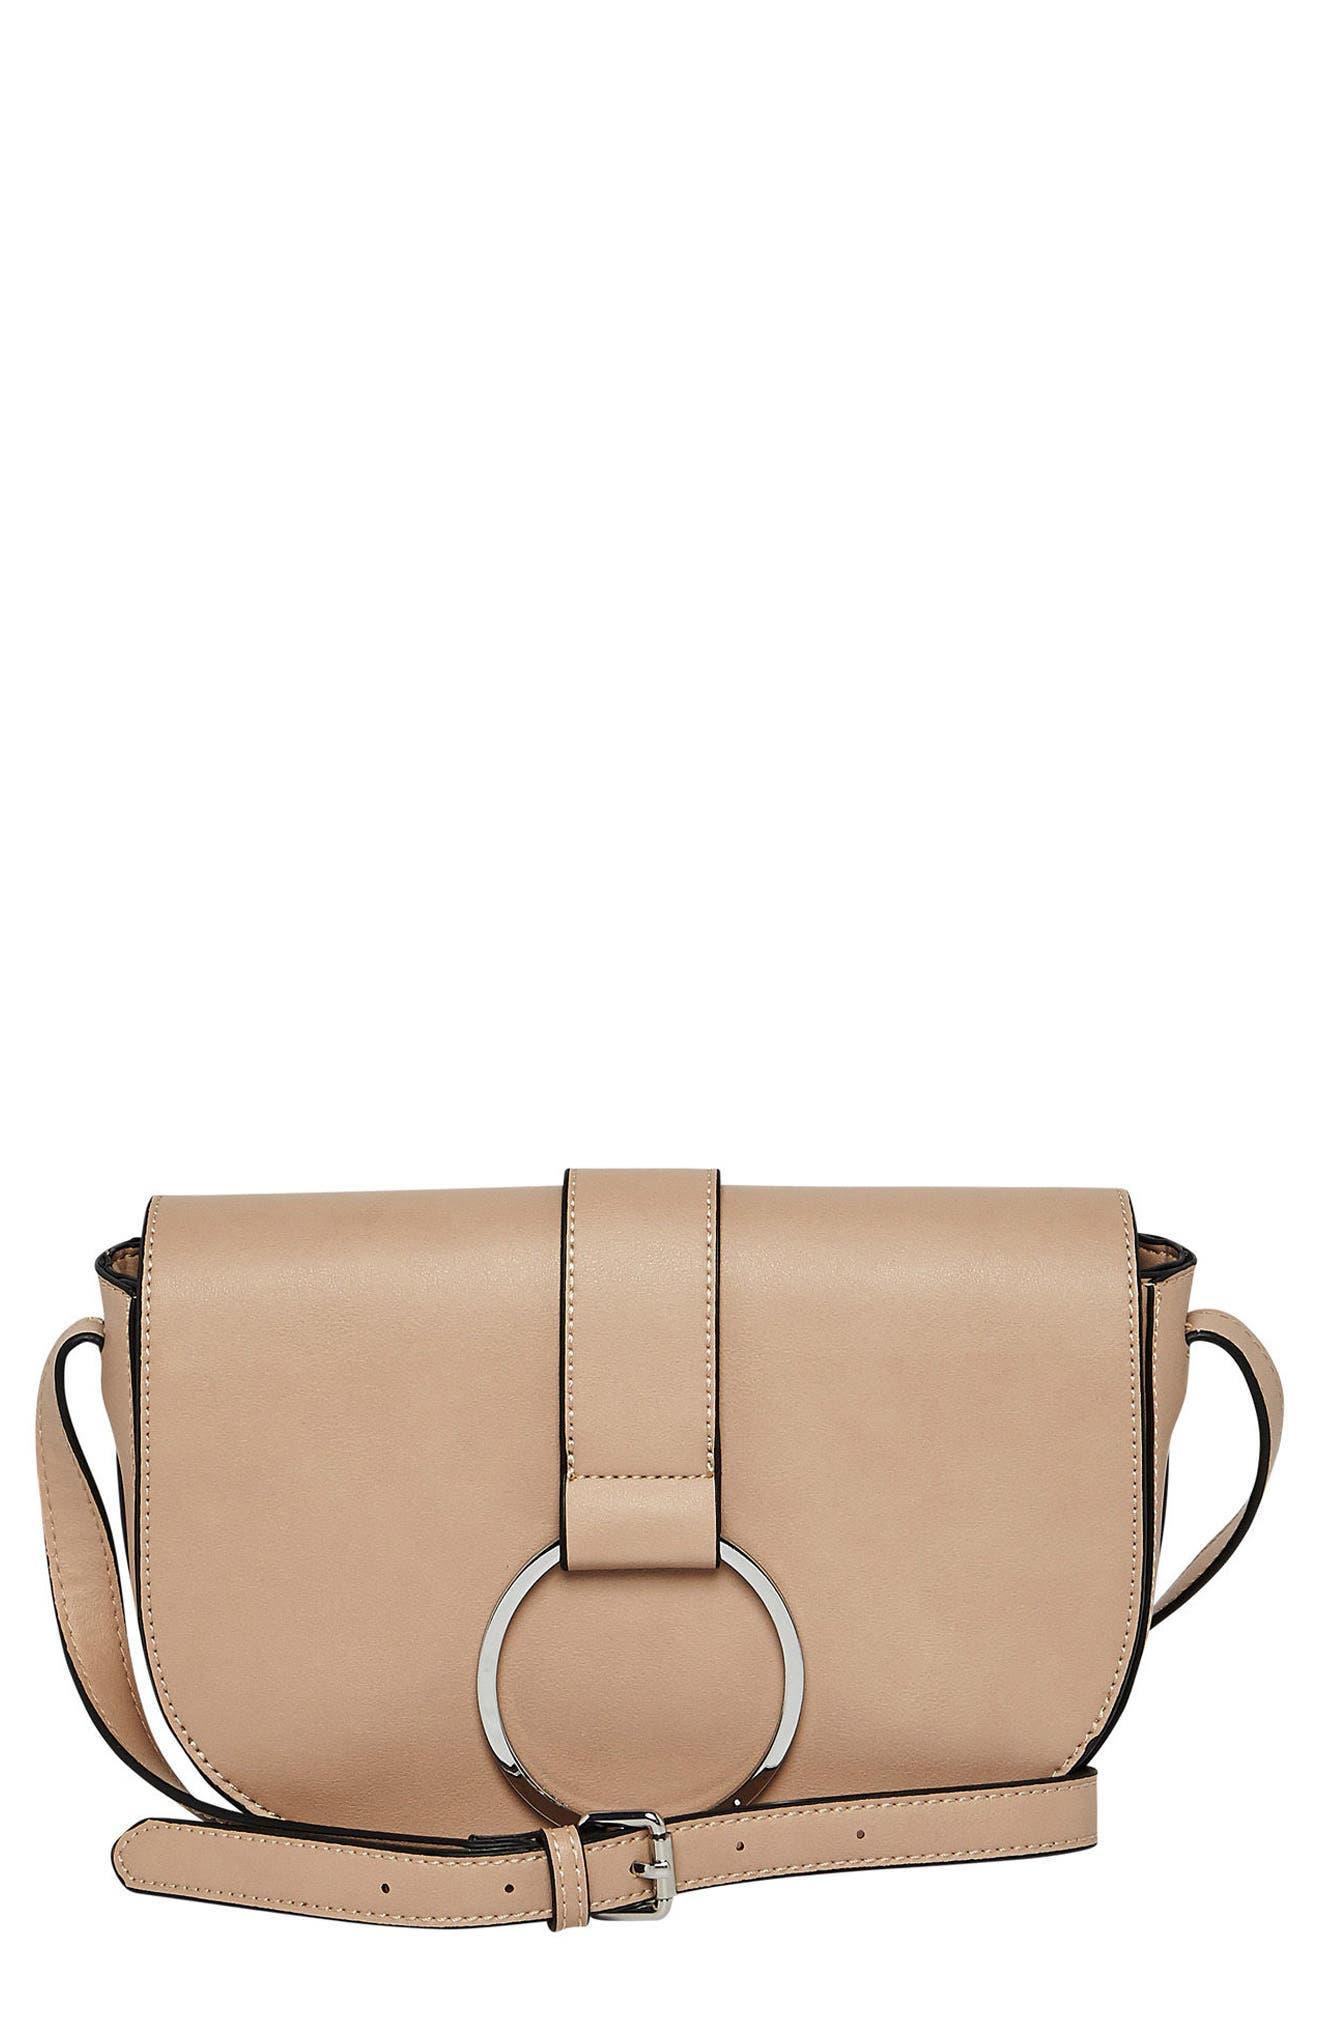 Lola Vegan Leather Crossbody Saddle Bag,                         Main,                         color, PINK